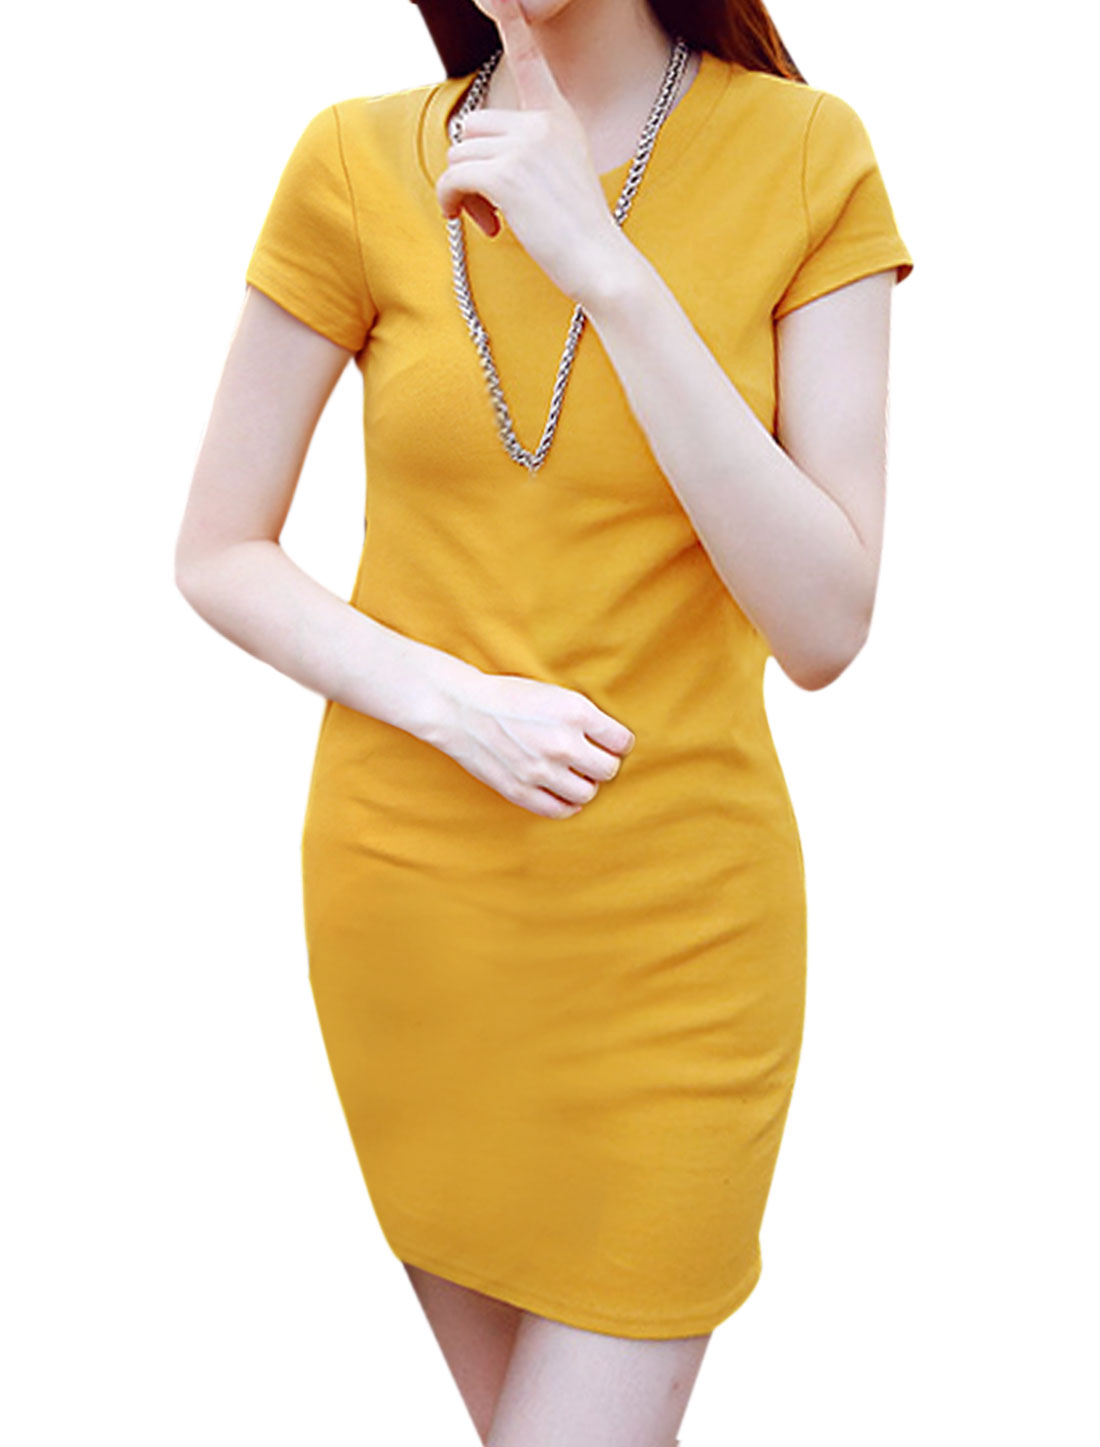 Ladies Round Neck Short Sleeves Slim Fit Tee Shirt Dress Yellow XS